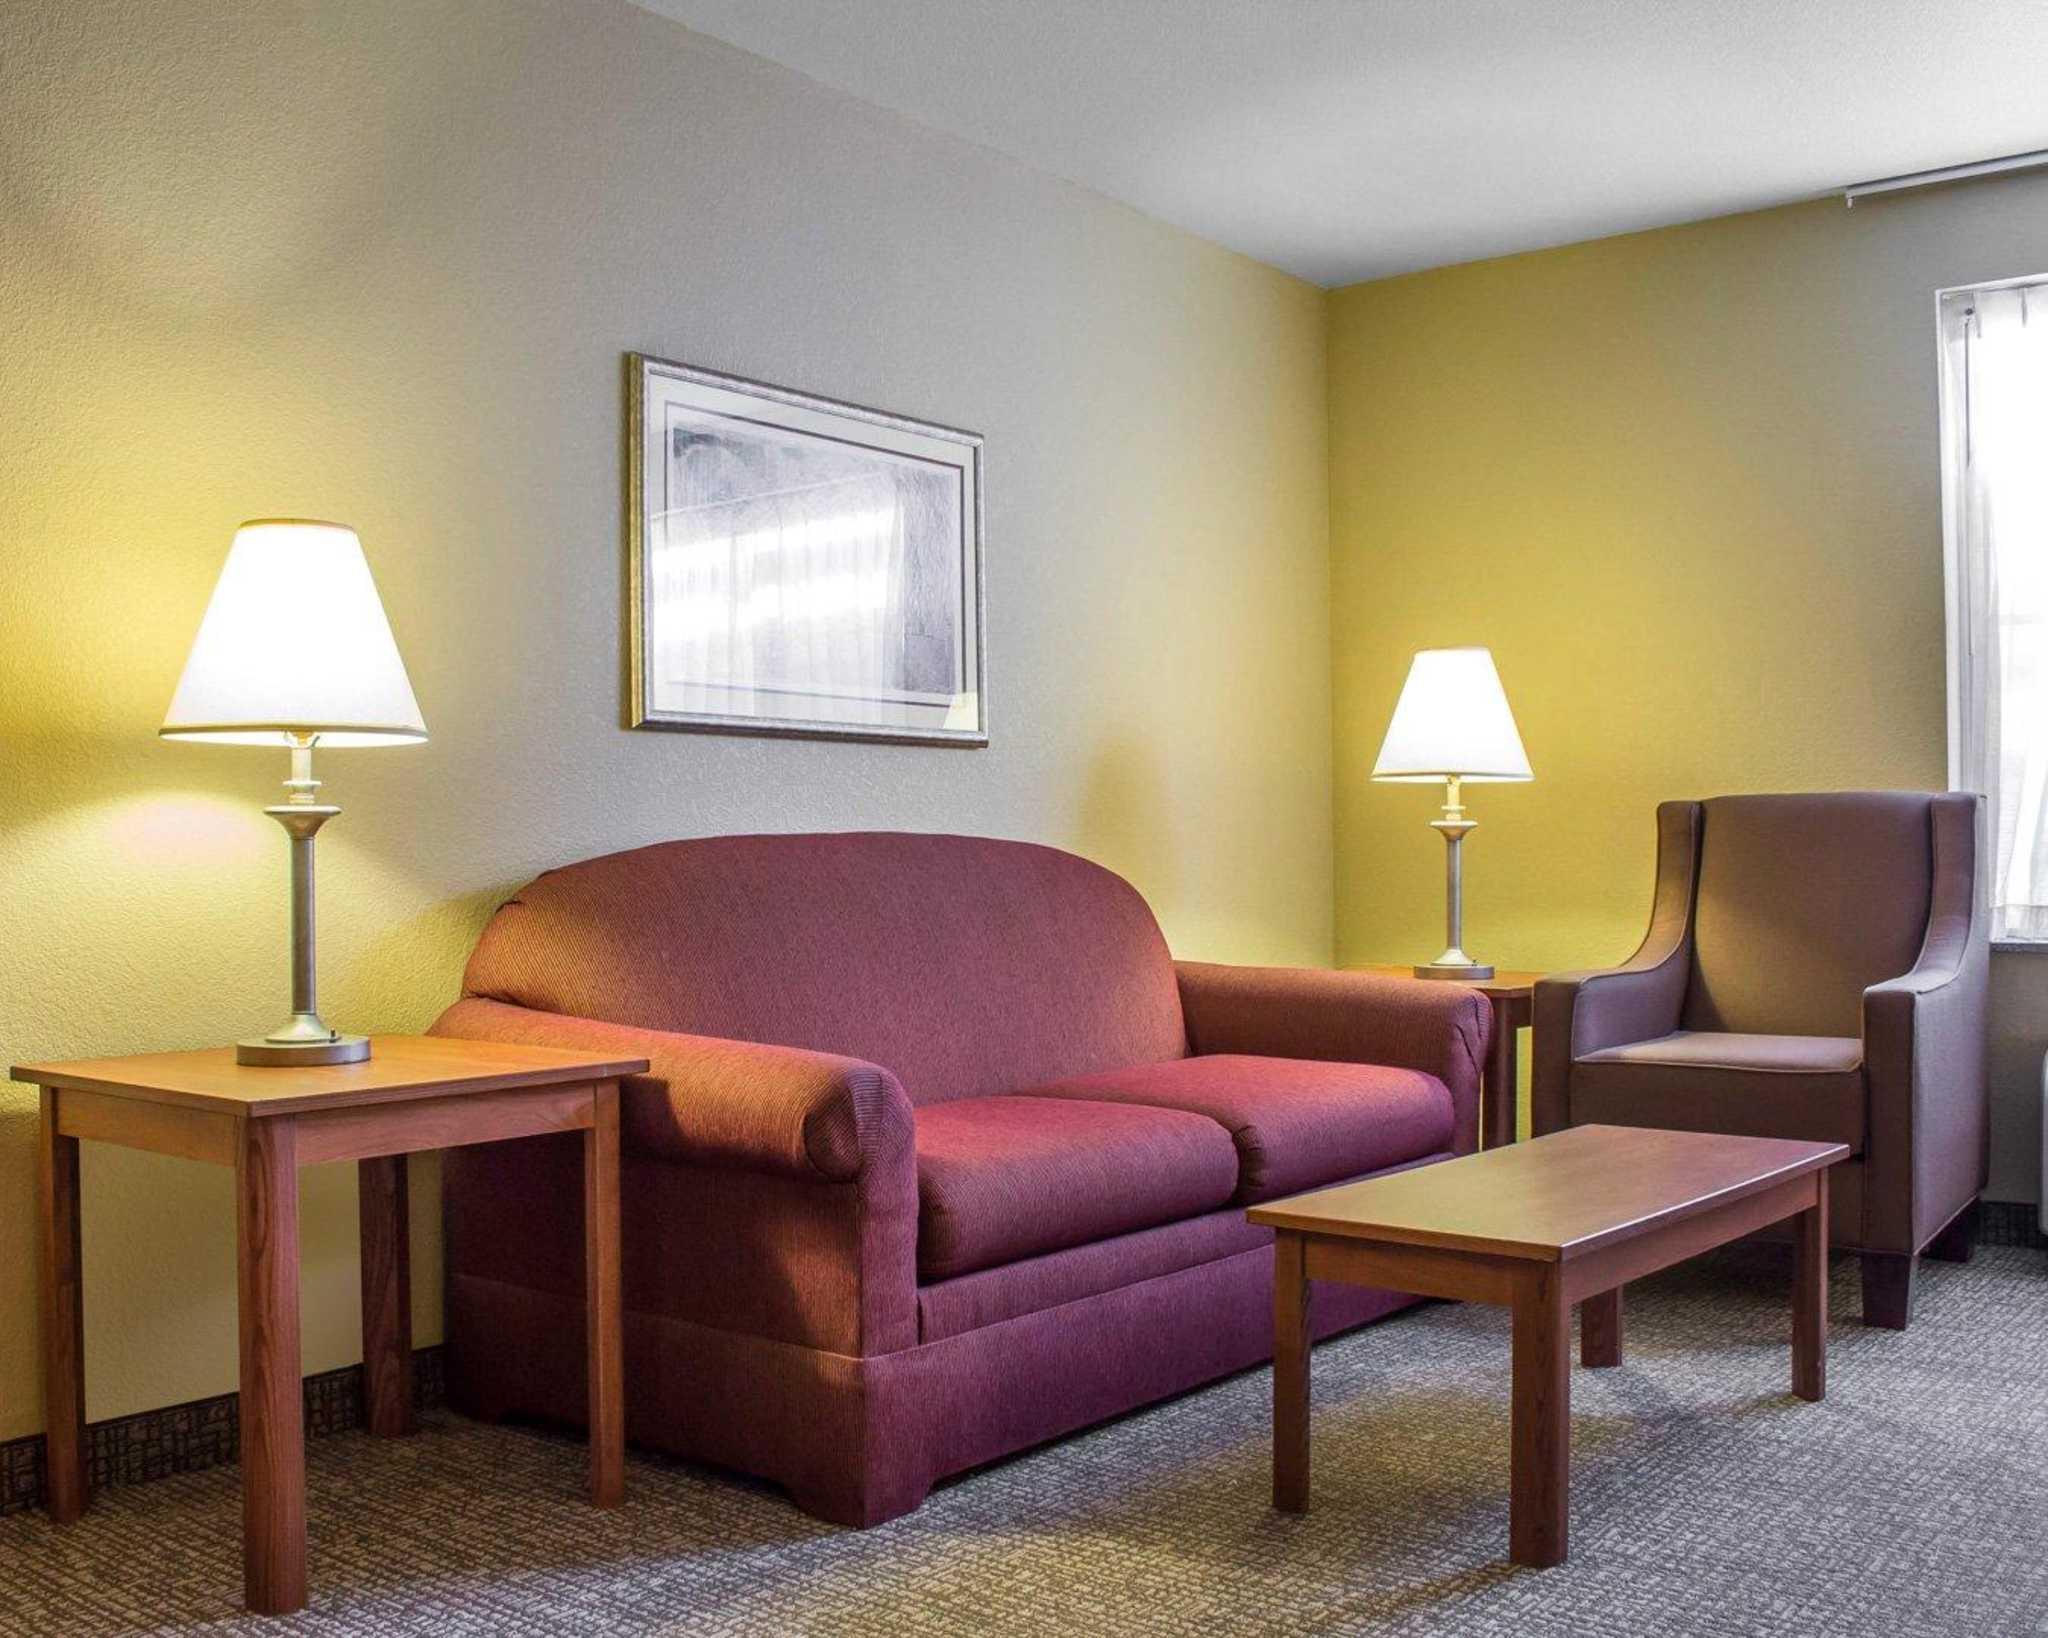 comforter hotels comfortinn turismo view restaurant uga comfort green az inn valley